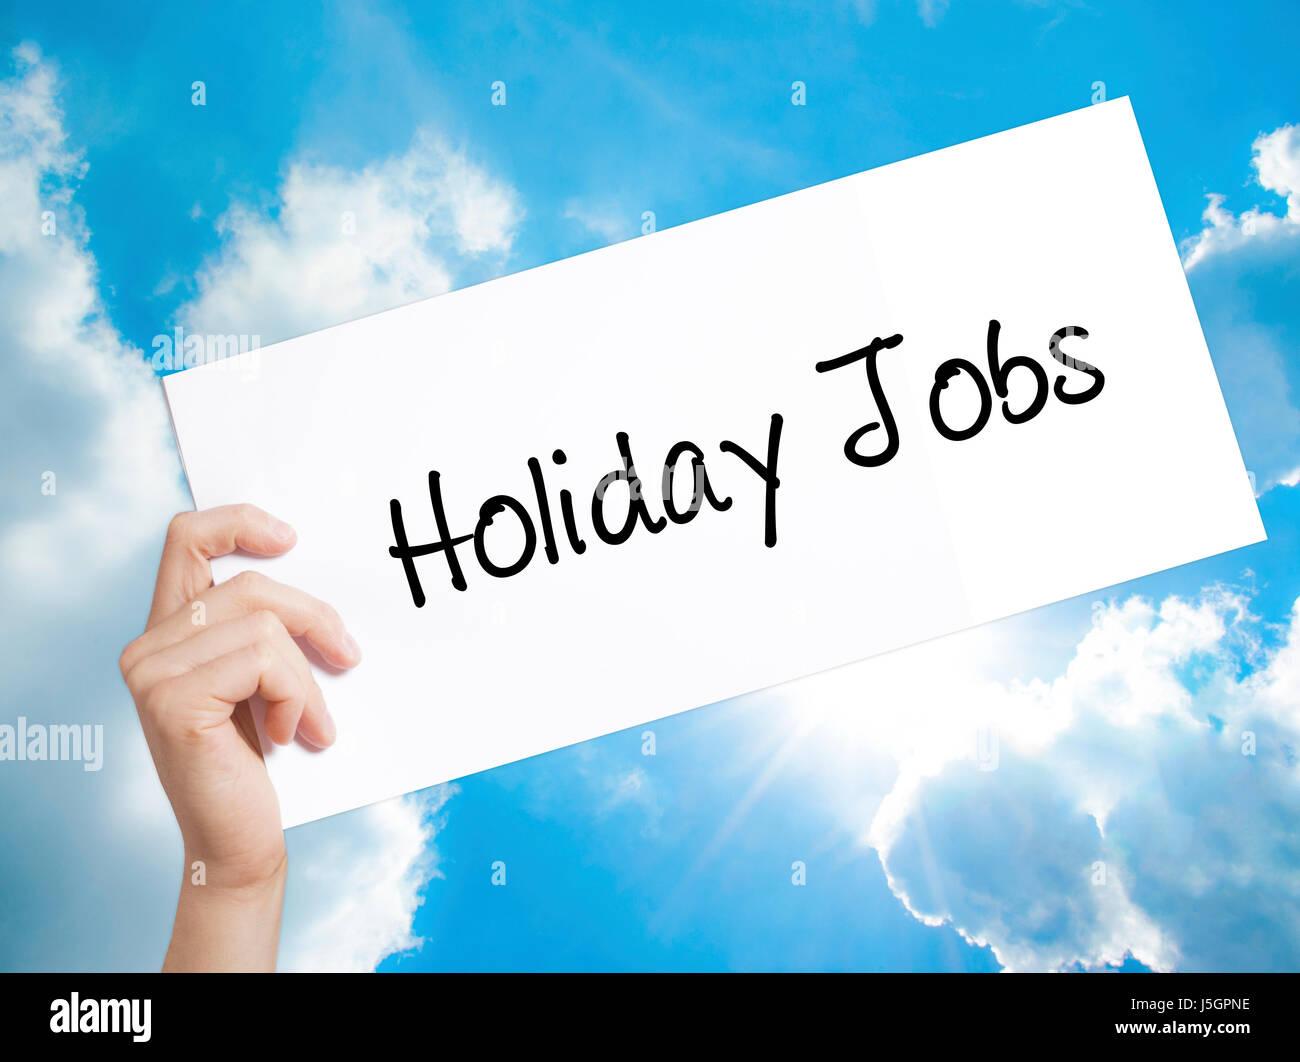 Holiday hand jobs